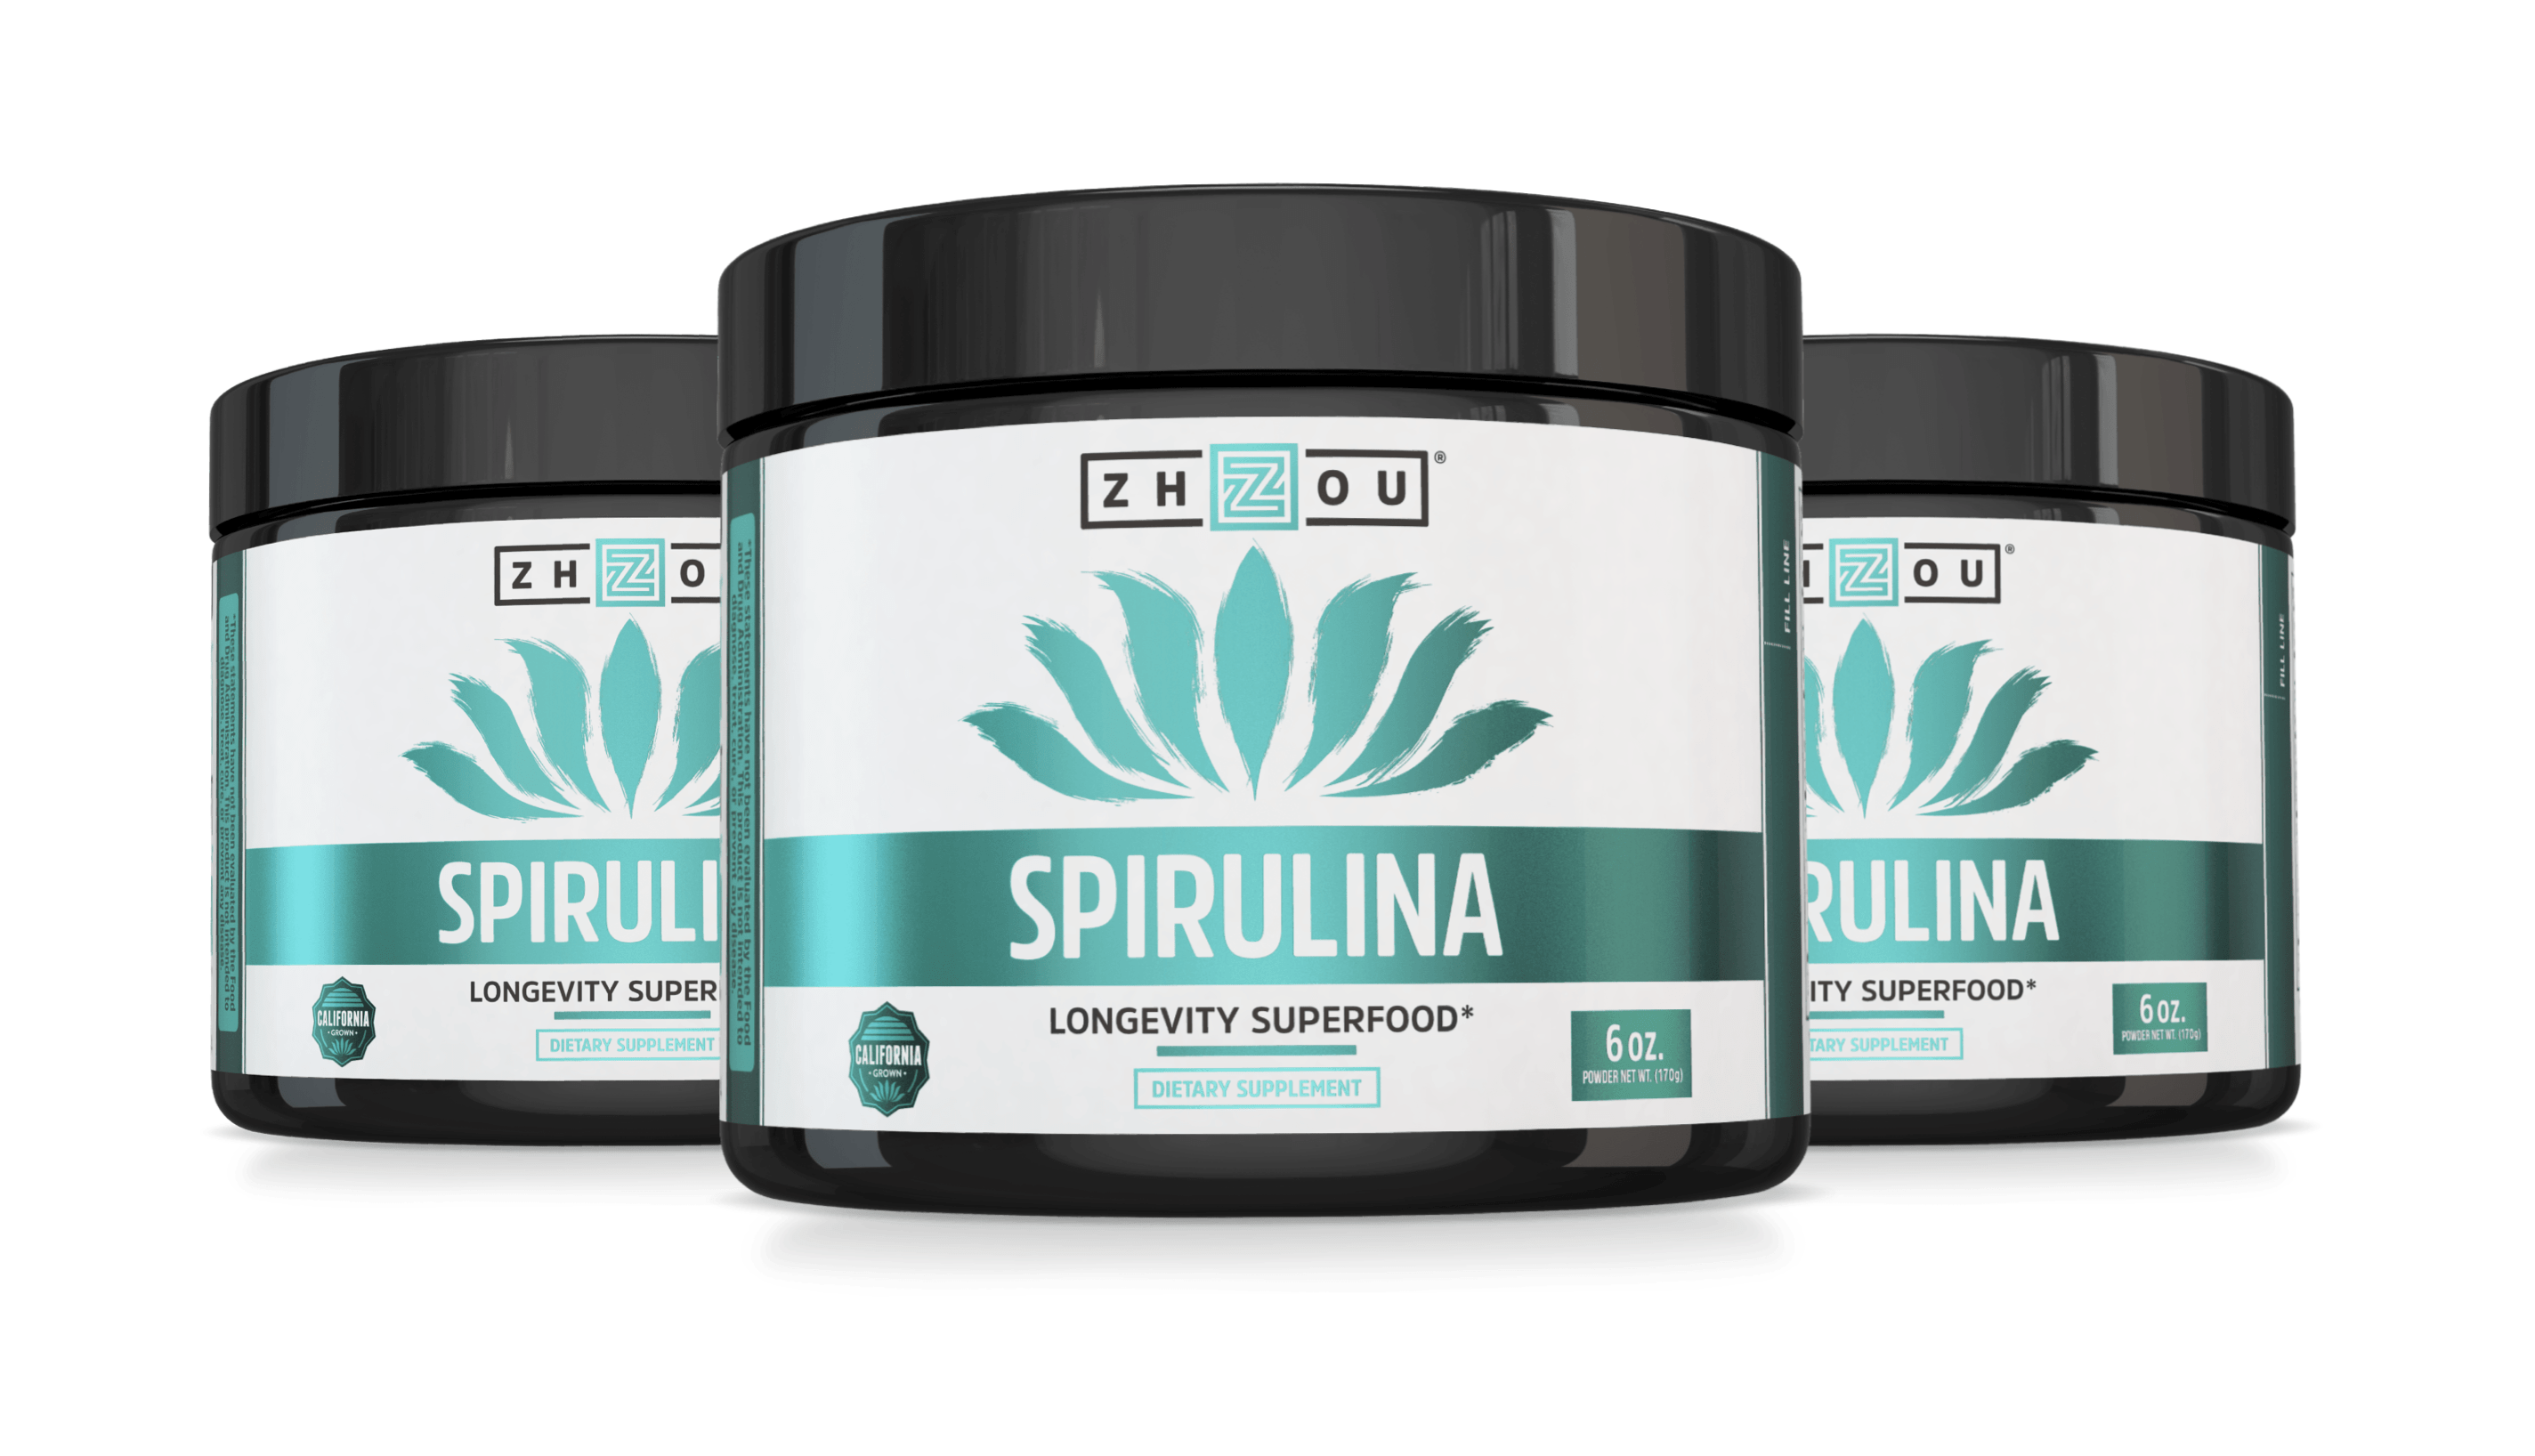 Zhou Spirulina Review – Is This Supplement Powder Worth The Price?